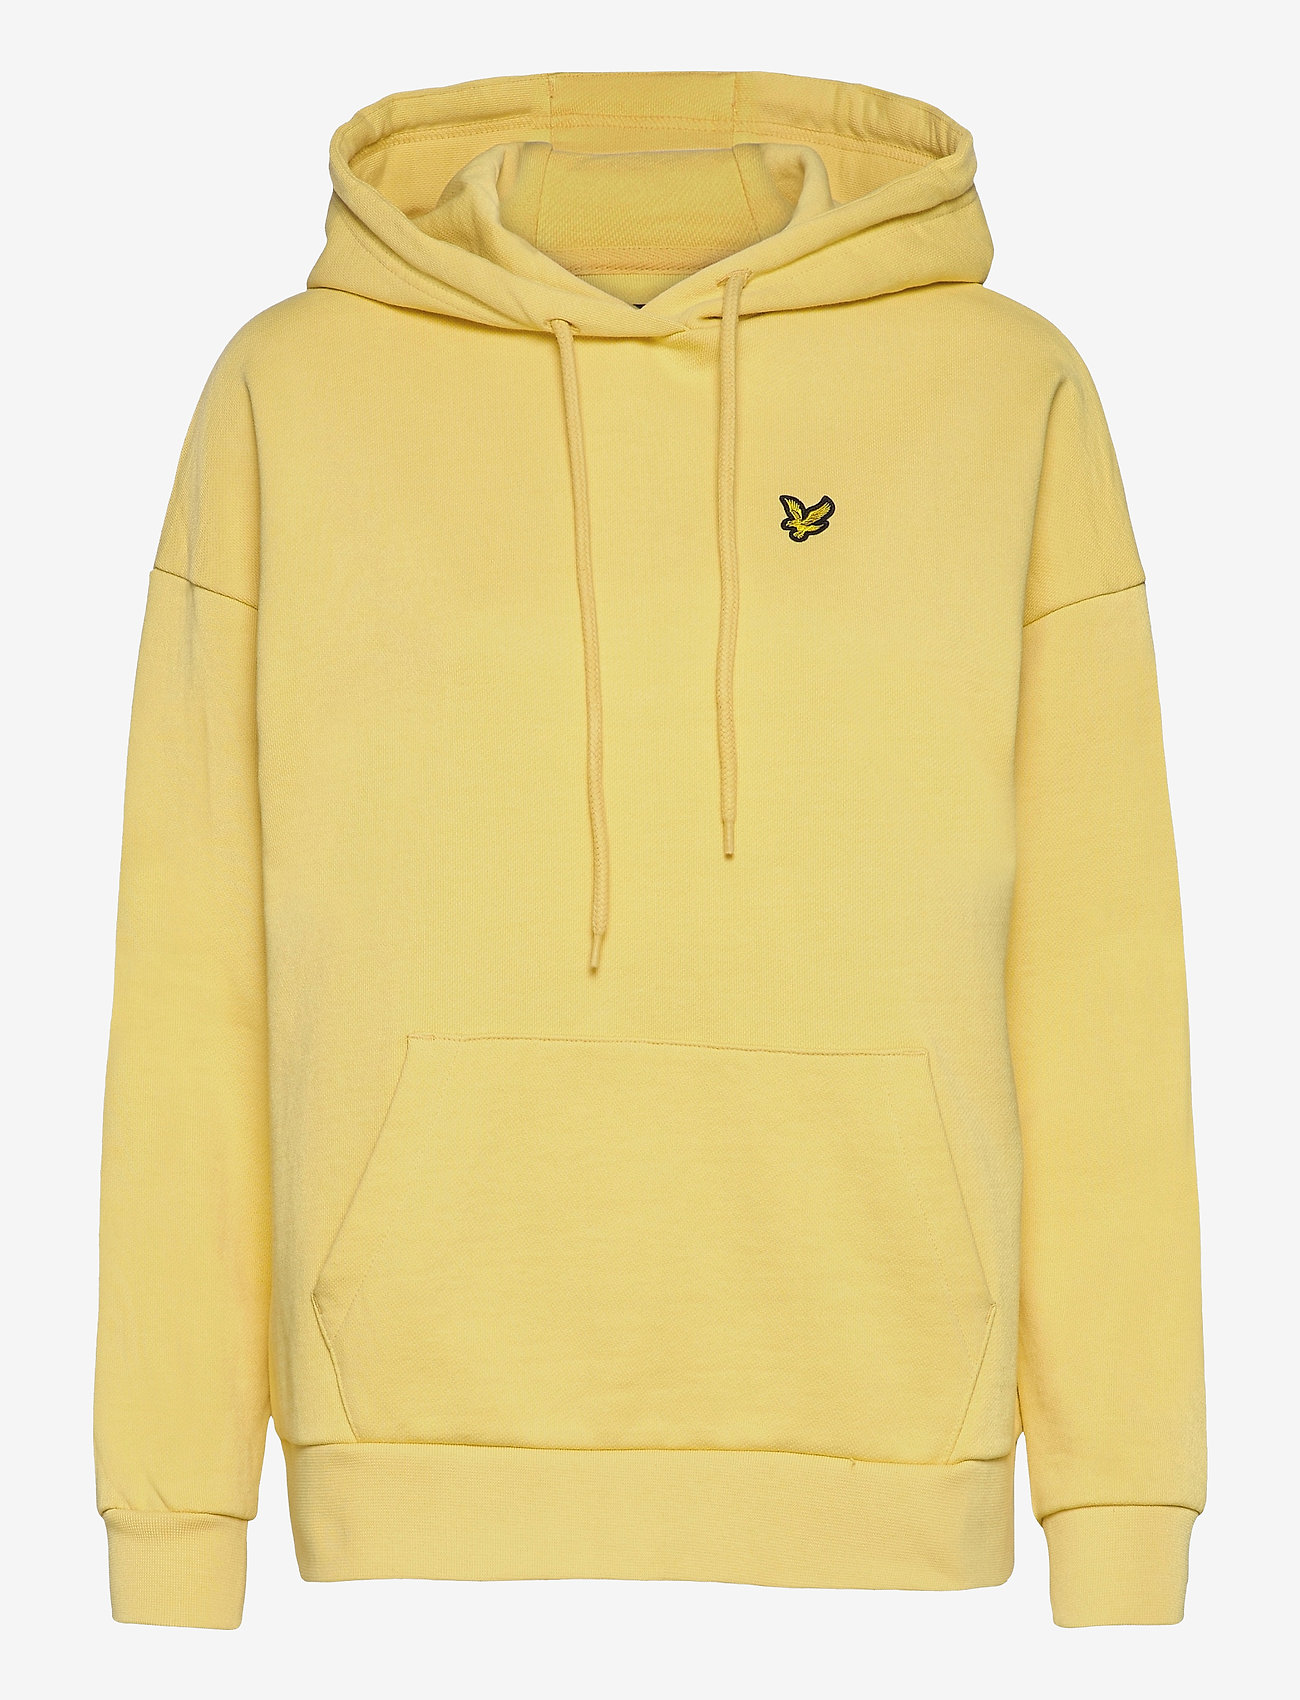 Lyle & Scott - Hoodie - sweatshirts & hoodies - sun daze - 0